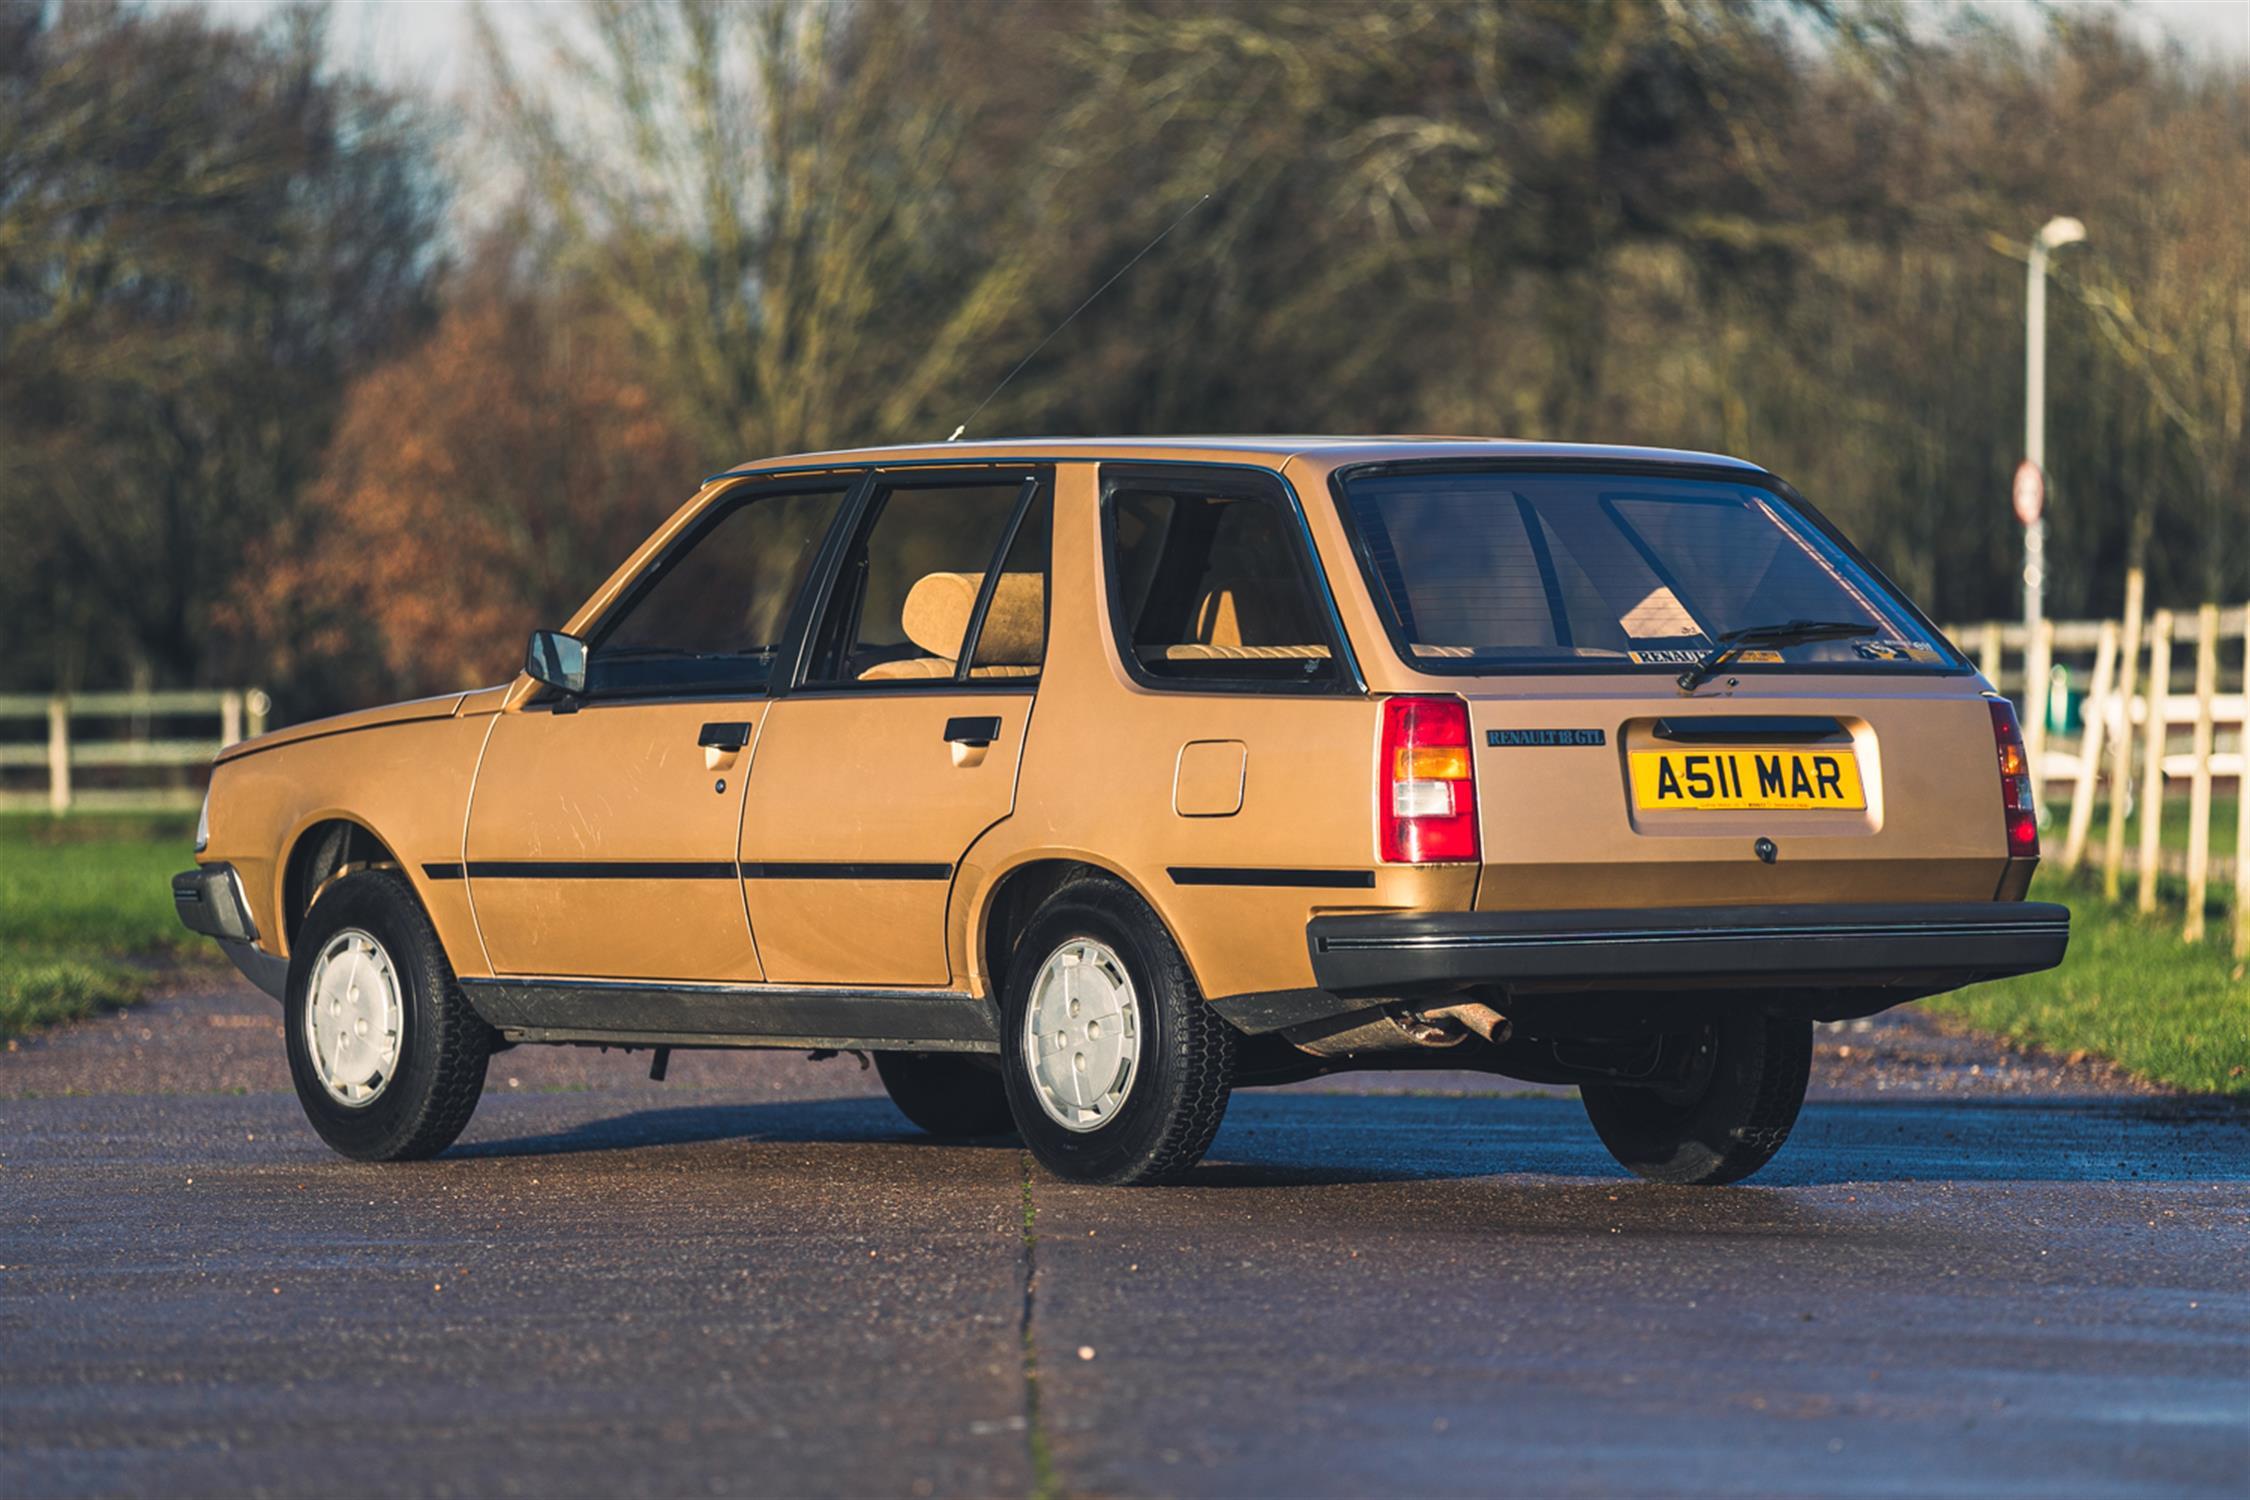 1983 Renault 18 GTL Estate - Image 2 of 32